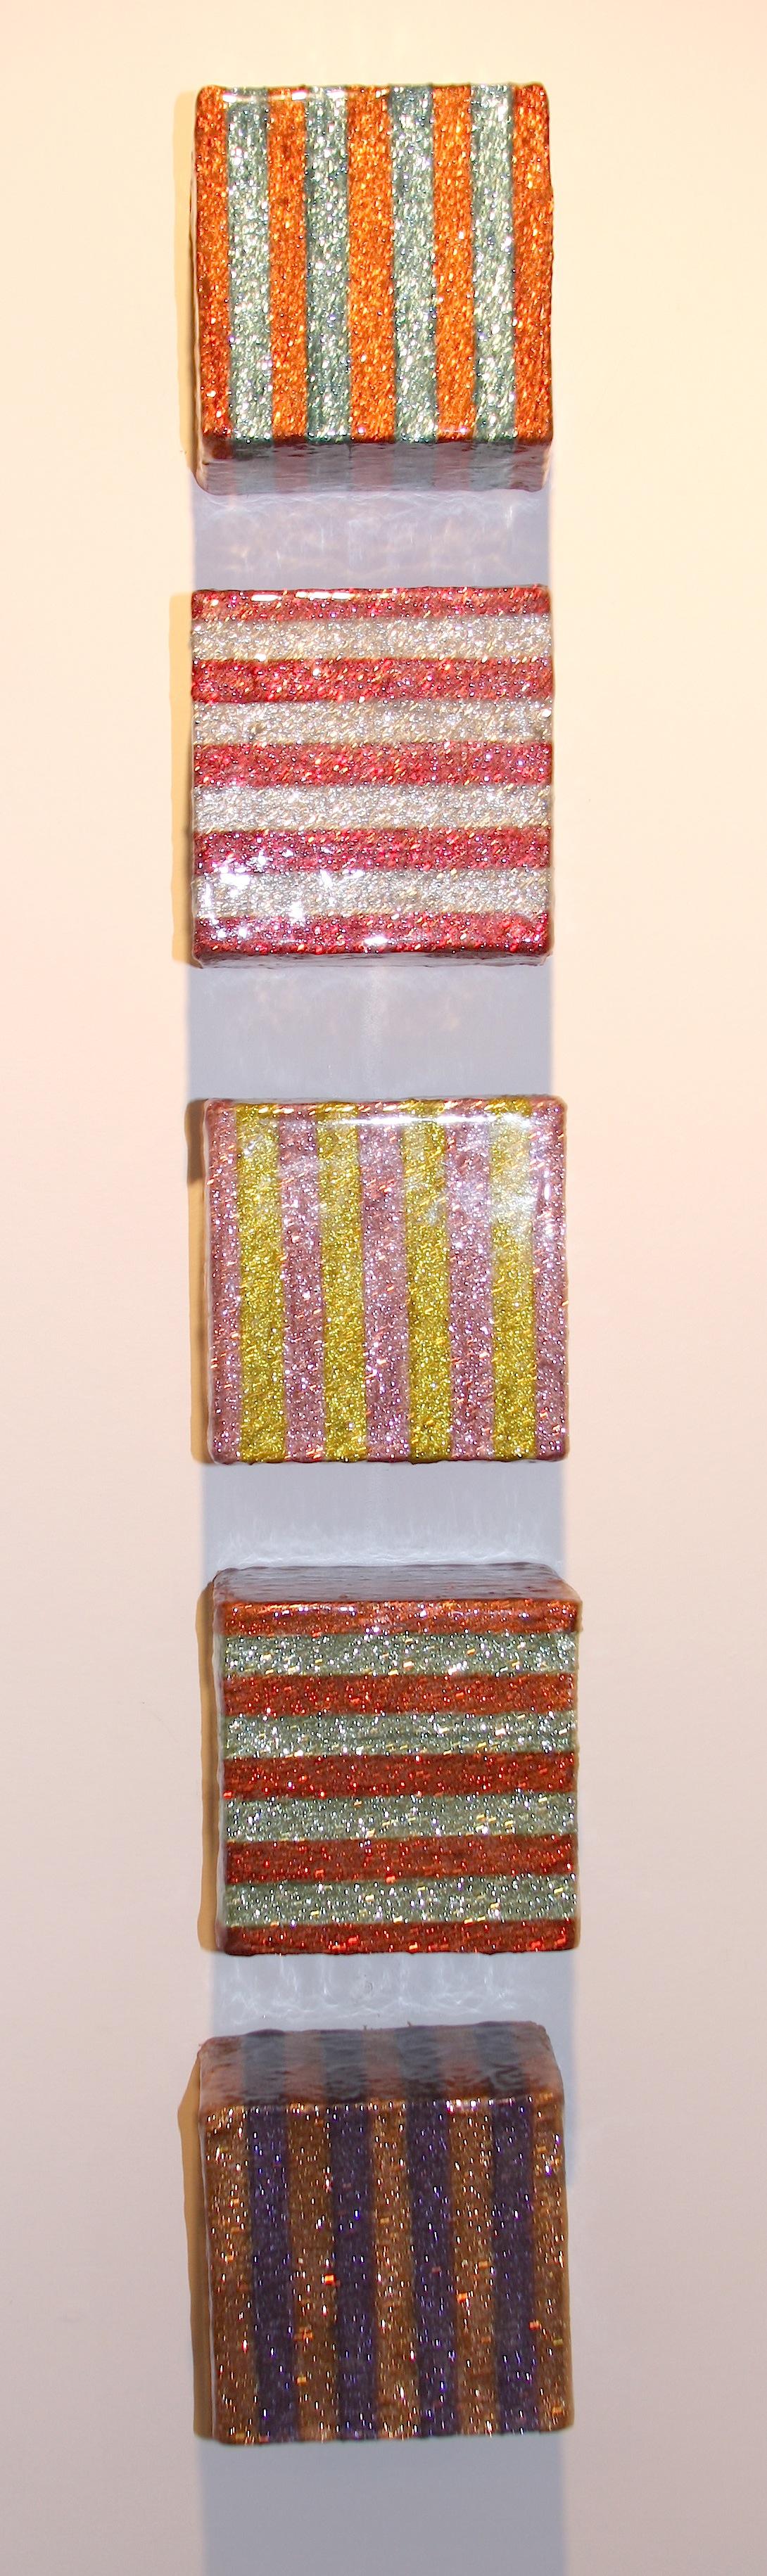 Sparkle Paintings RD Exhbit 6.JPG